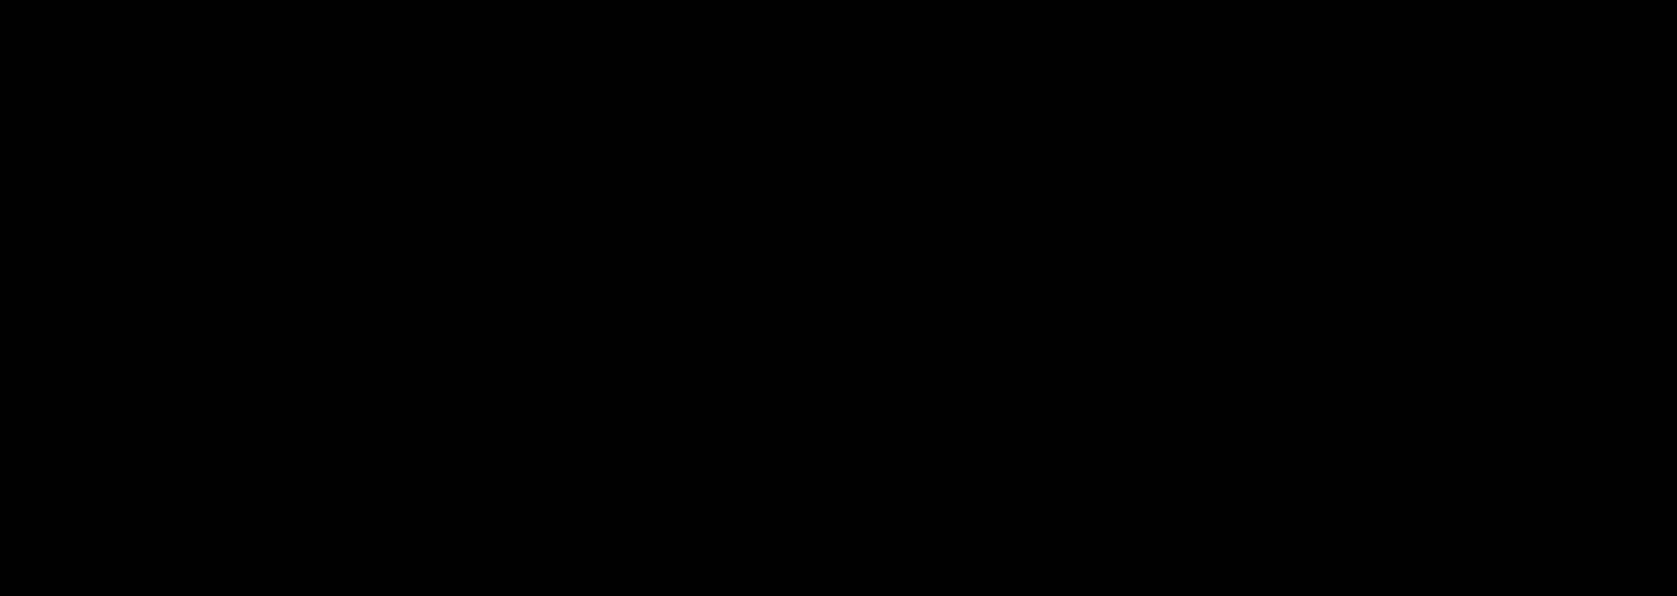 image96.png